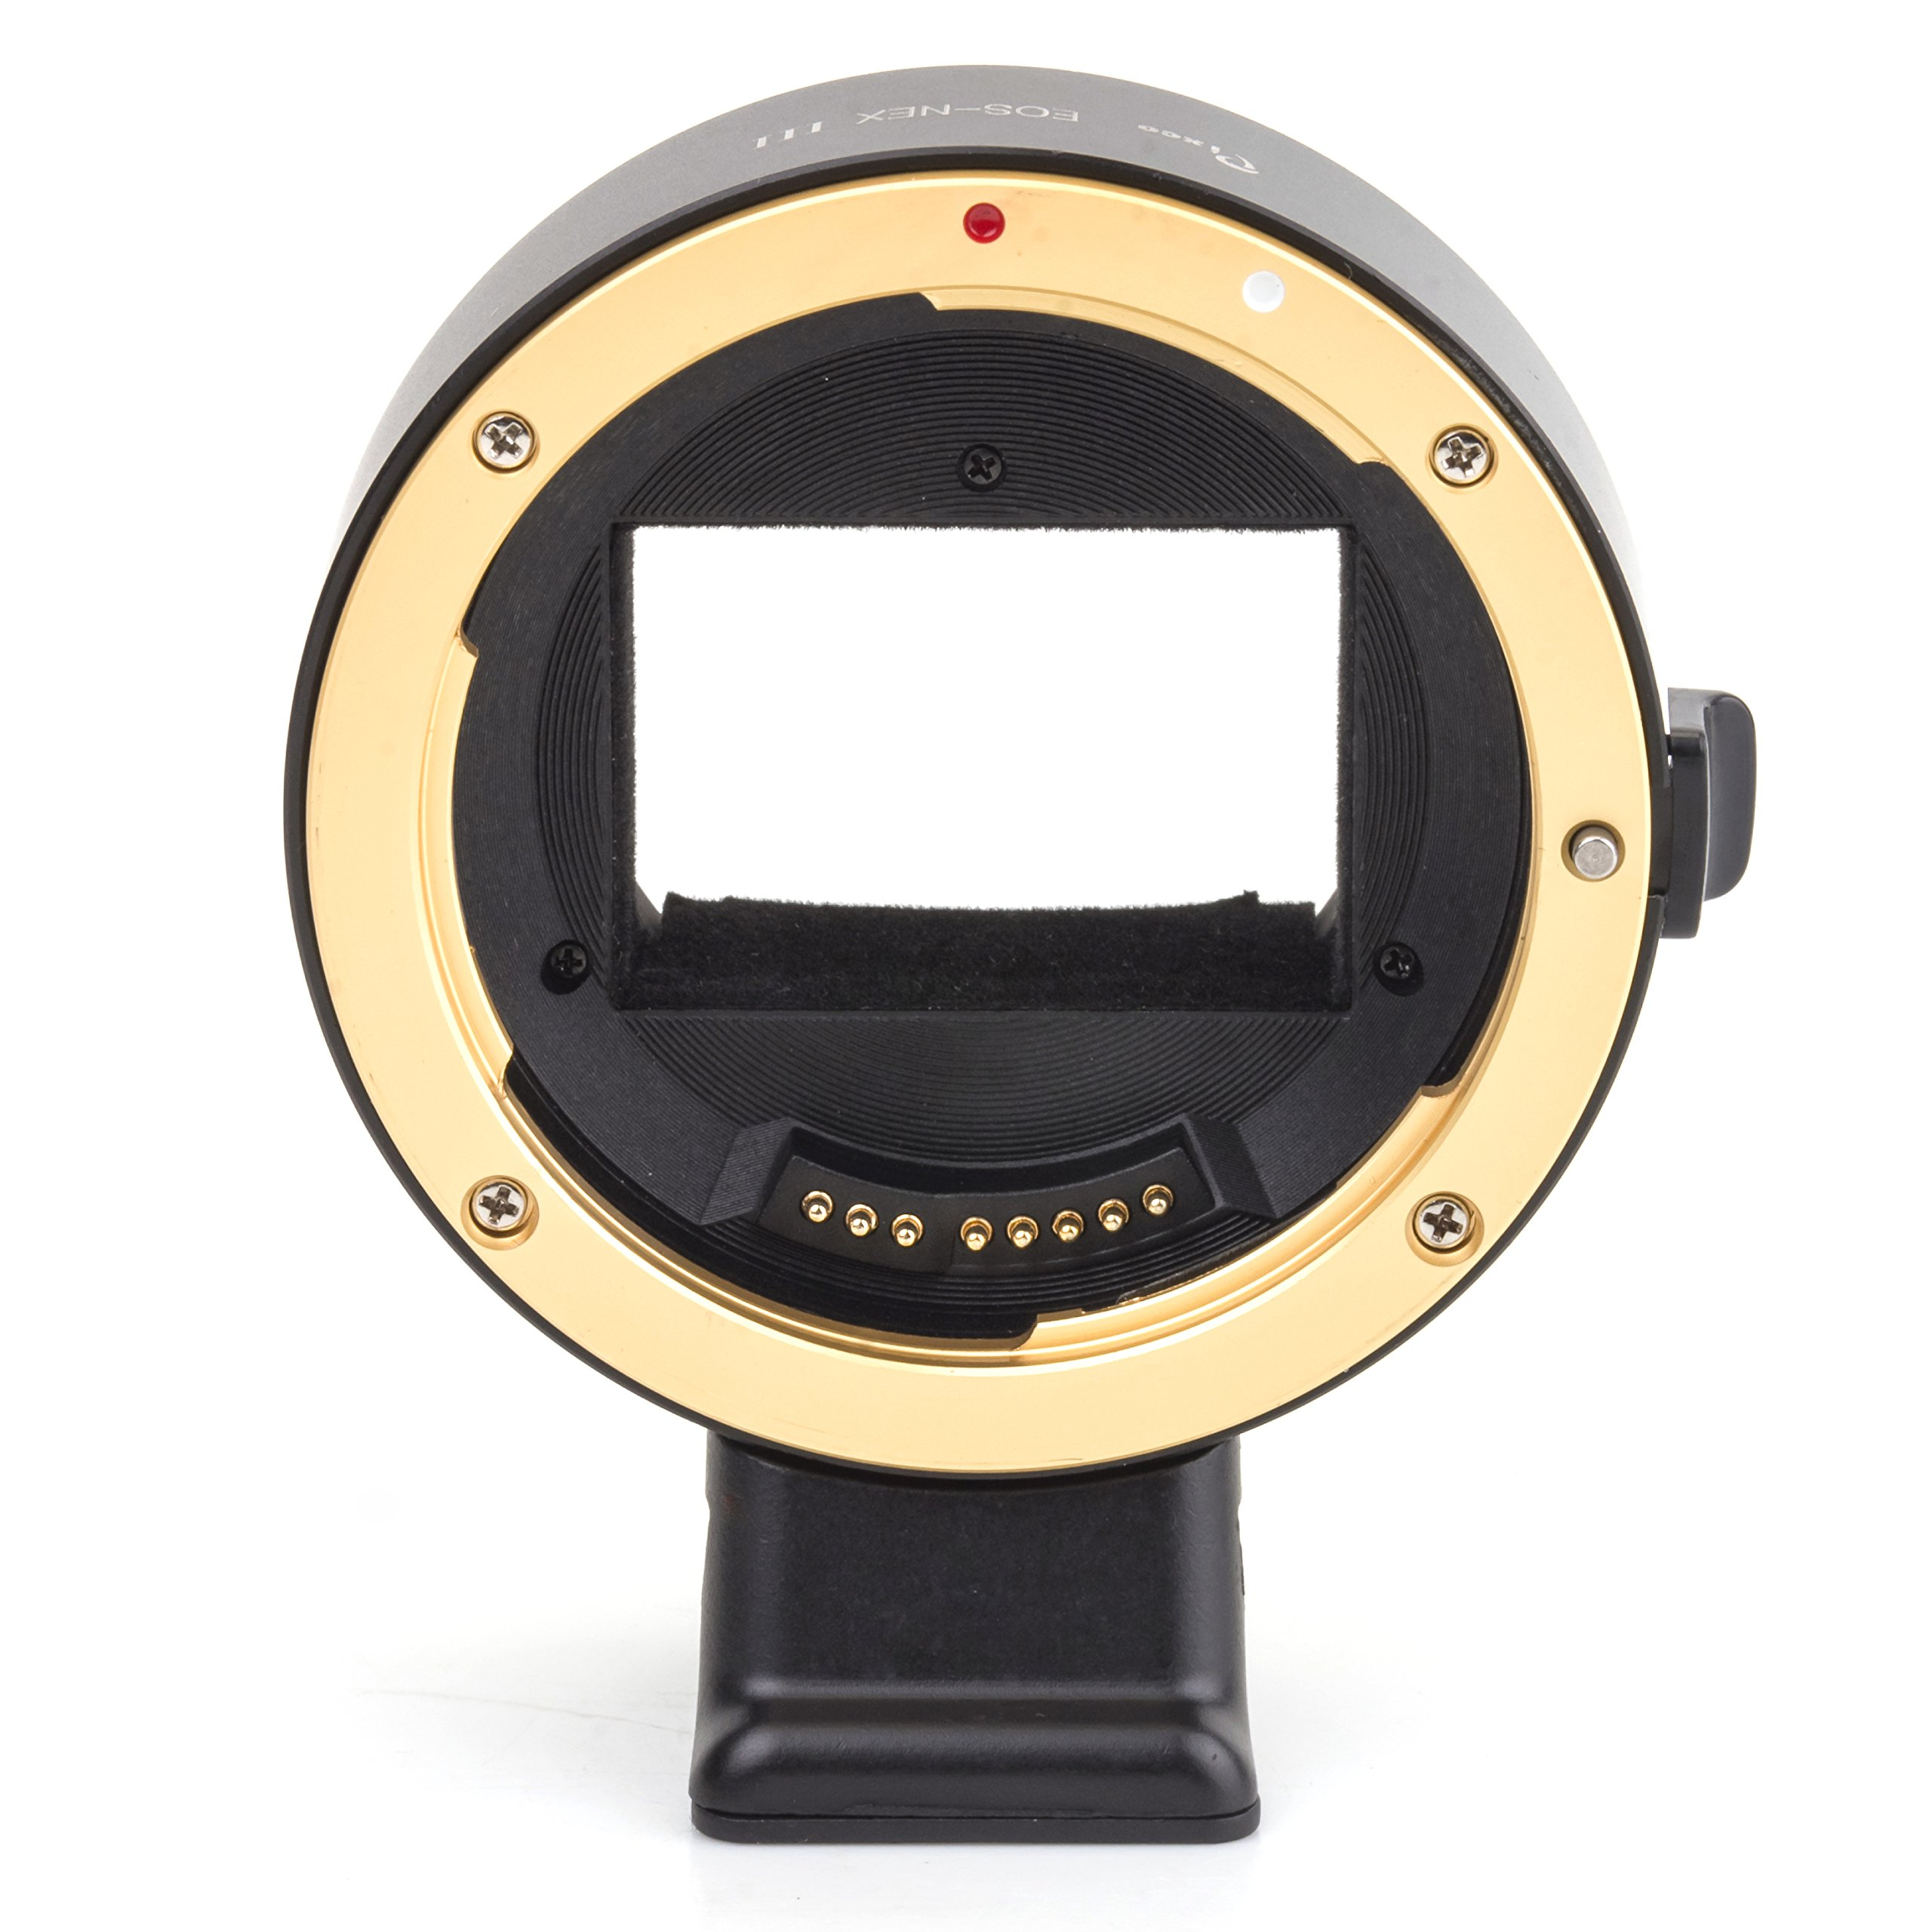 Pixco Pixco 3rd Generation Upgrade Auto Focus Af Canon Ef Ef-s EOS Lens to Sony NEX E Full Framed Mount Adapter Ring for Sony NEX-5T,NEX-7,NEX-7K,NEX-6,NEX-3,NEX-C3,NEX-F3,NEX-3N,NEX-5R,NEX-5C